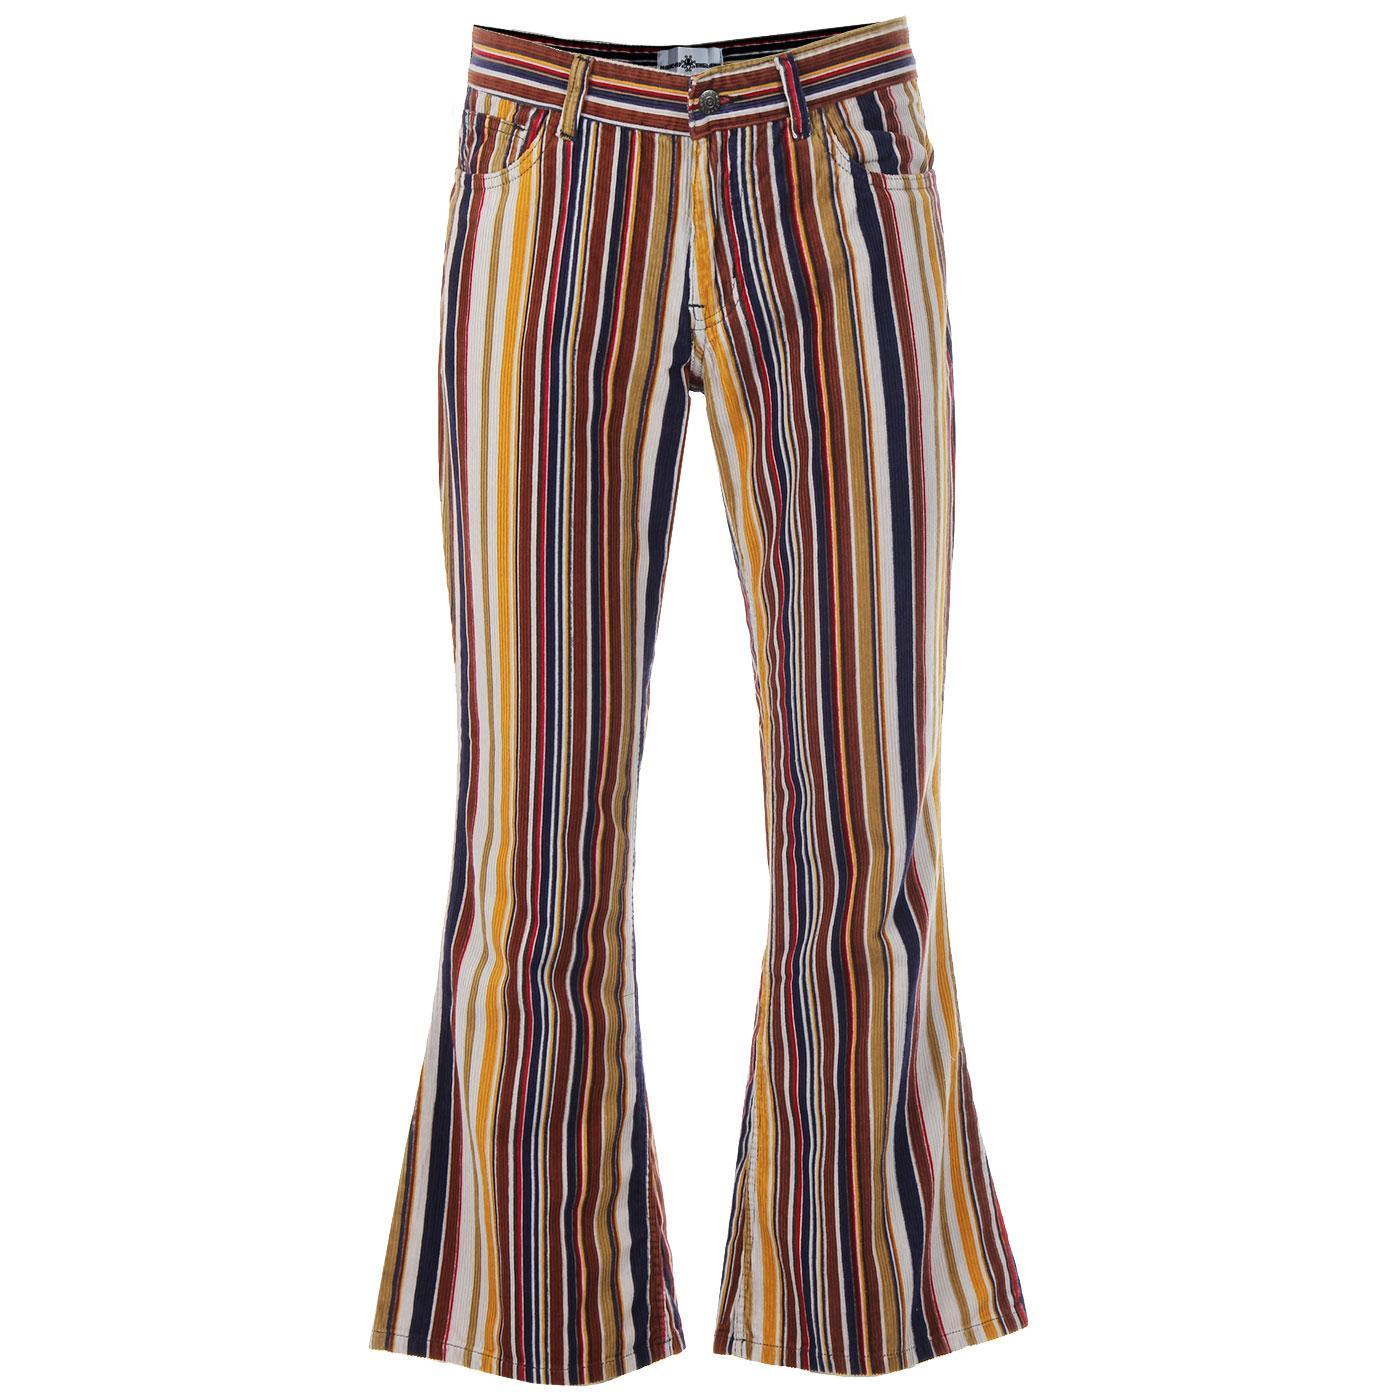 Killer Stripe MADCAP ENGLAND Retro 70s Cord Flares